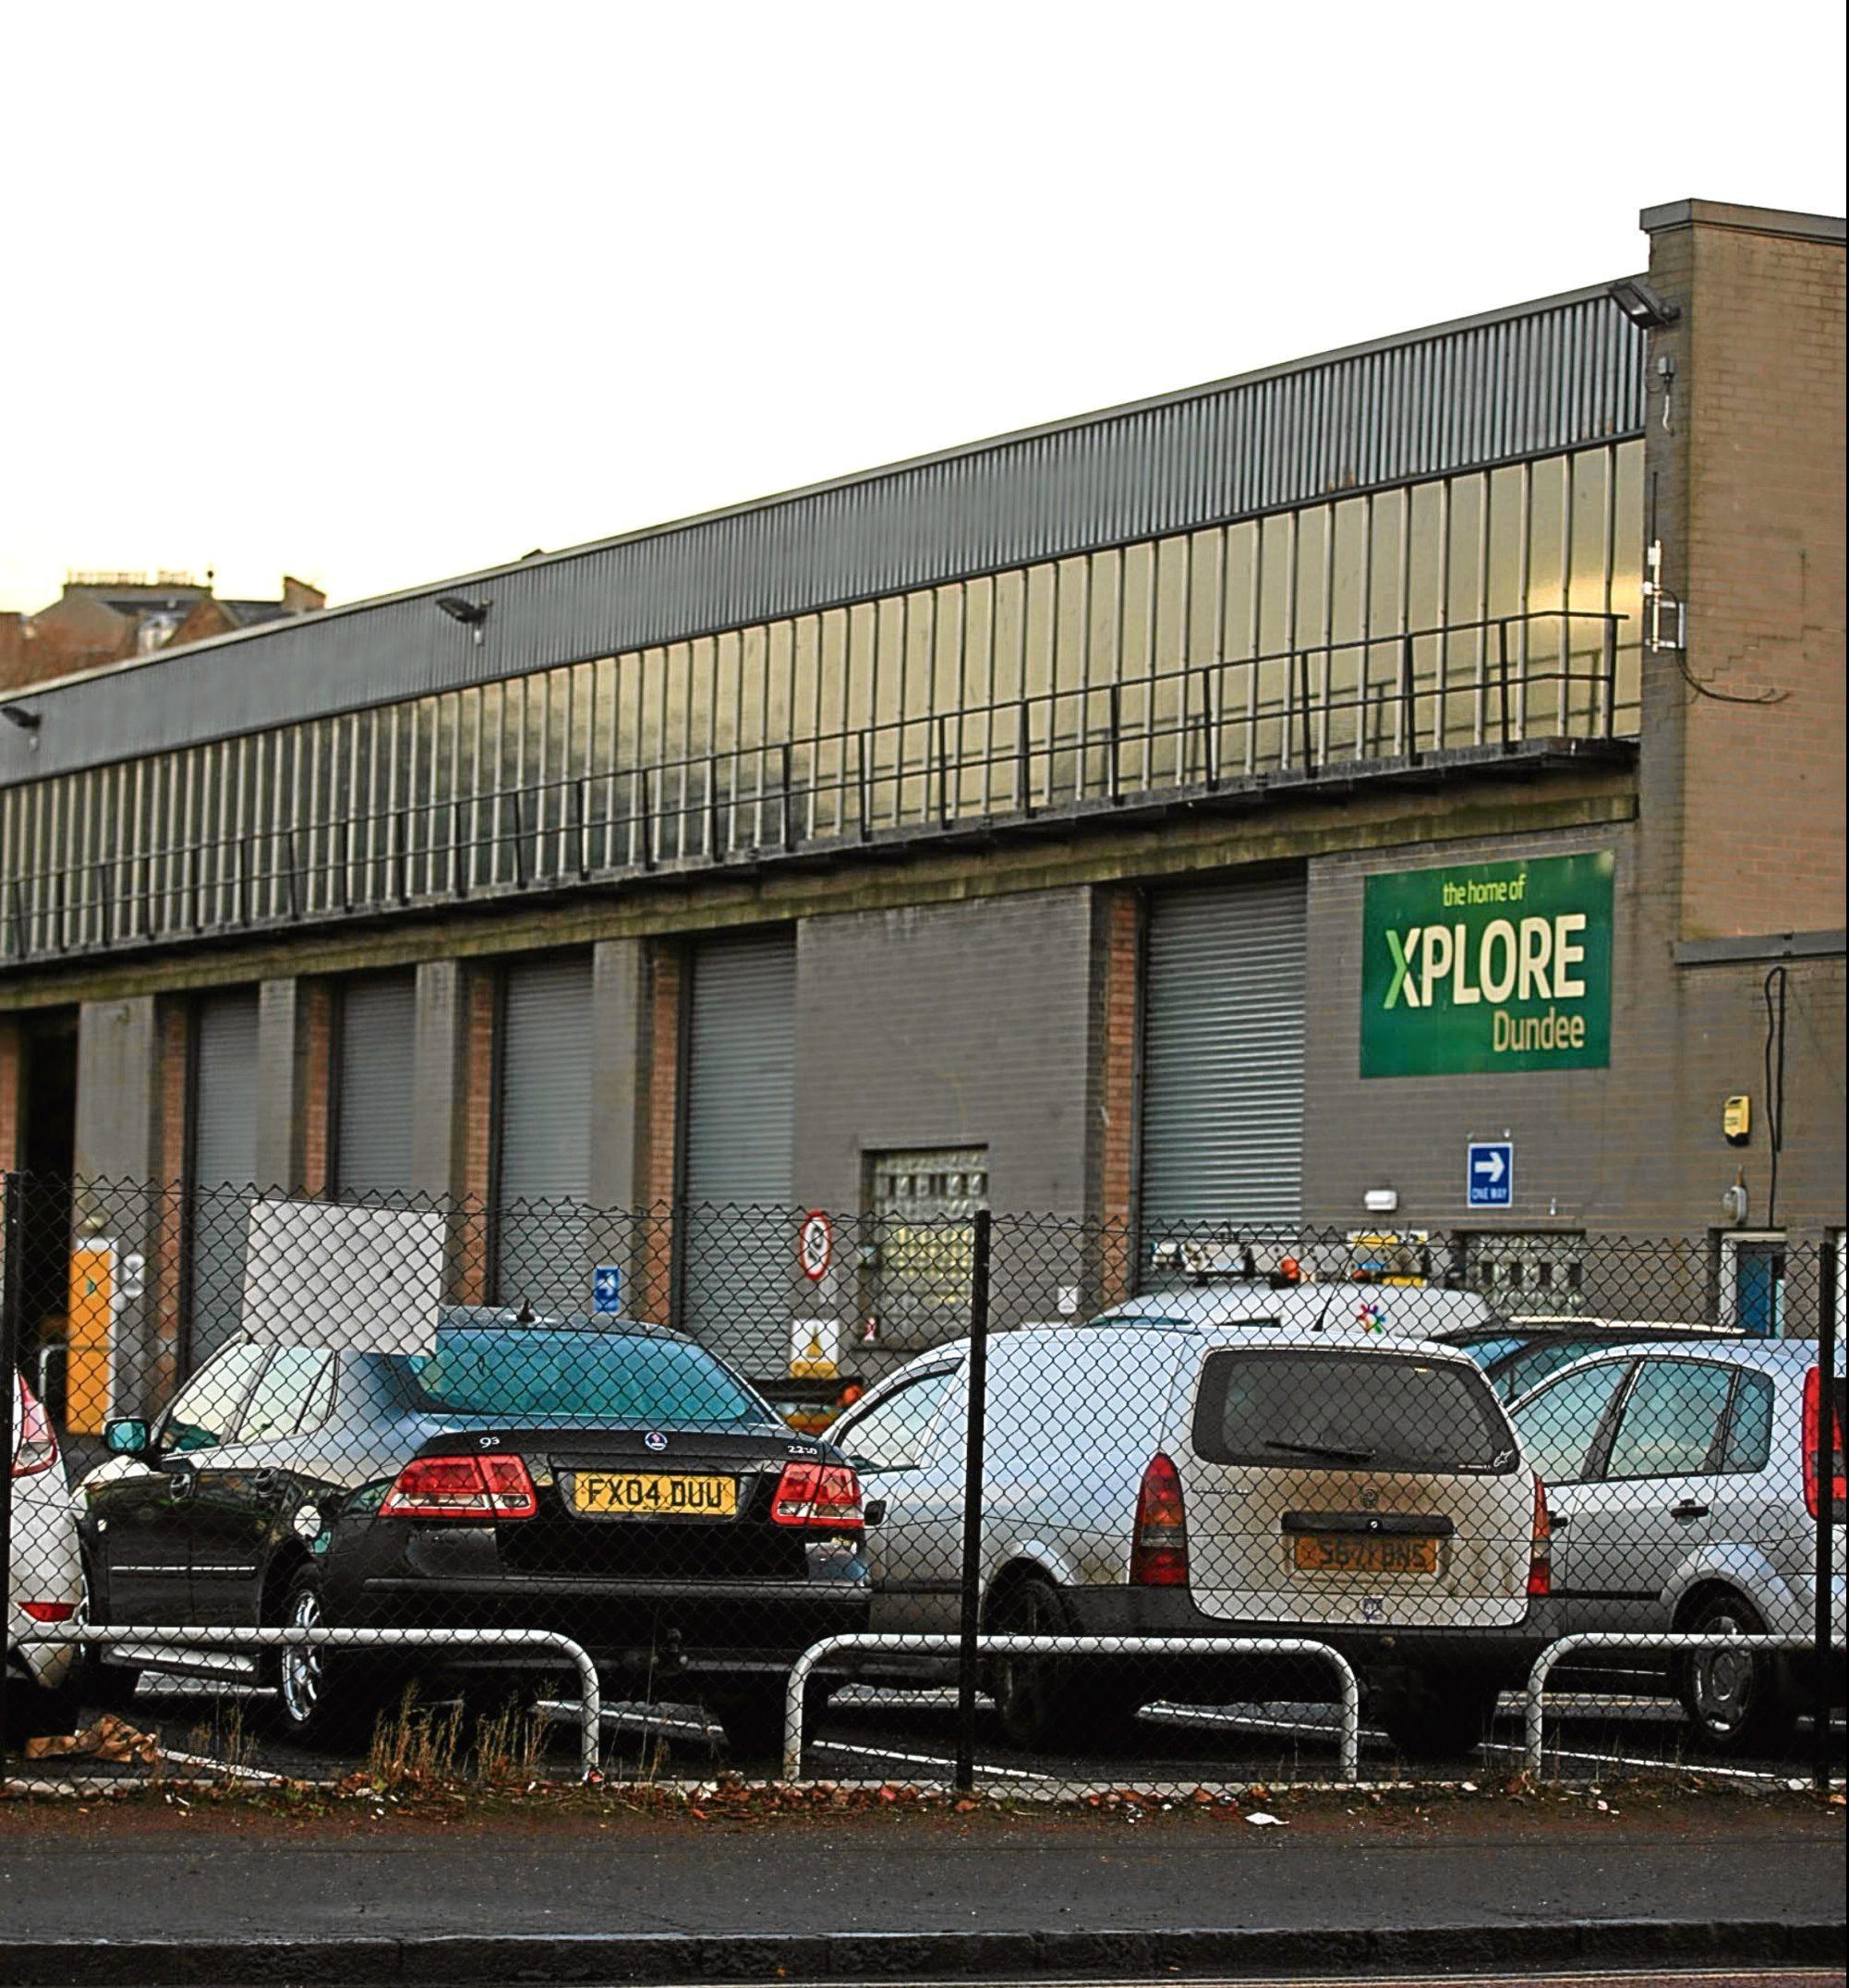 Xplore's Dundee Depot in Dock Street